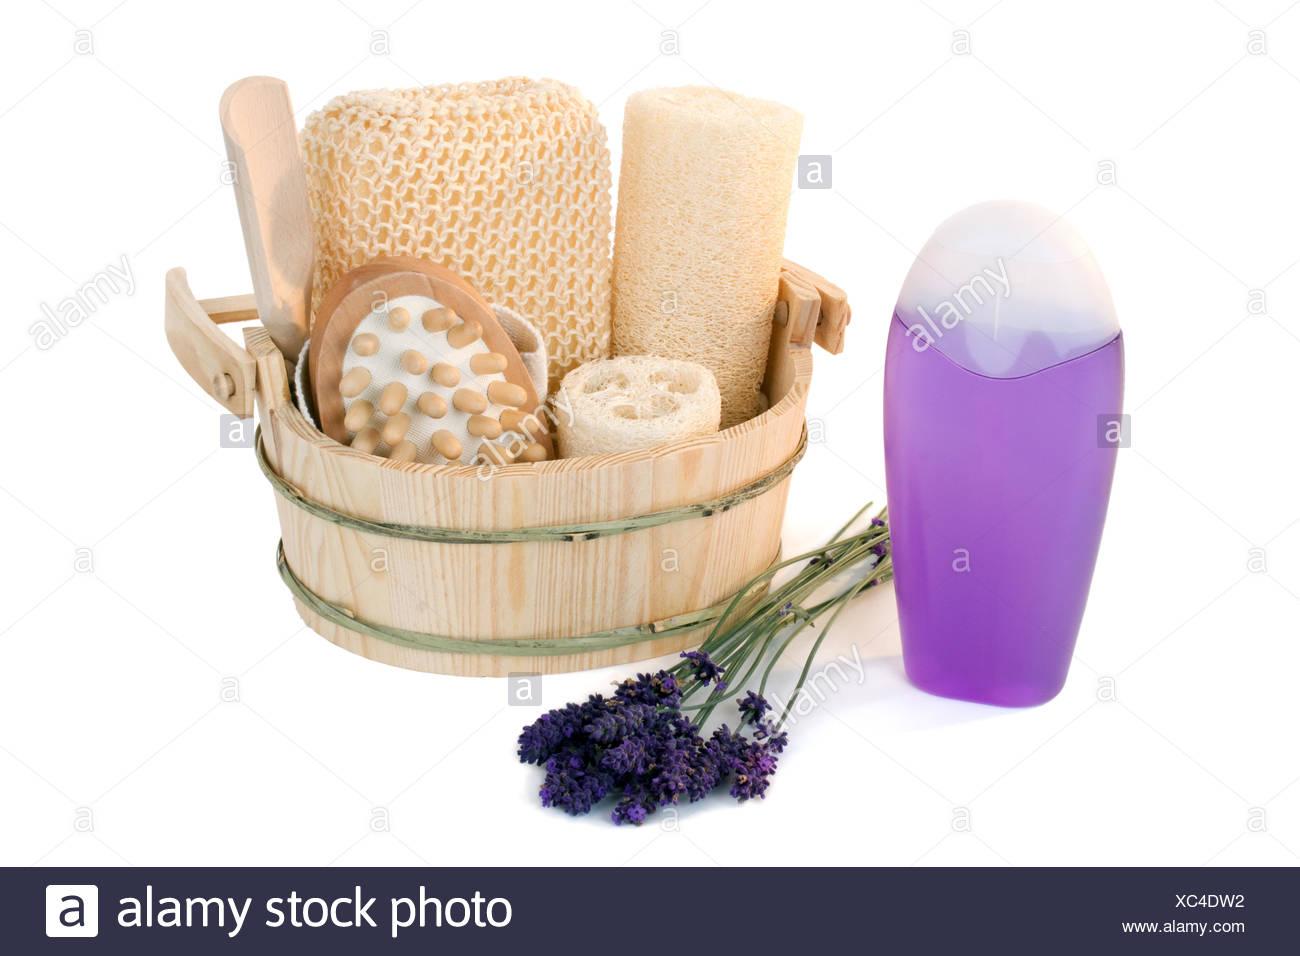 Shower gel with lavender - Stock Image